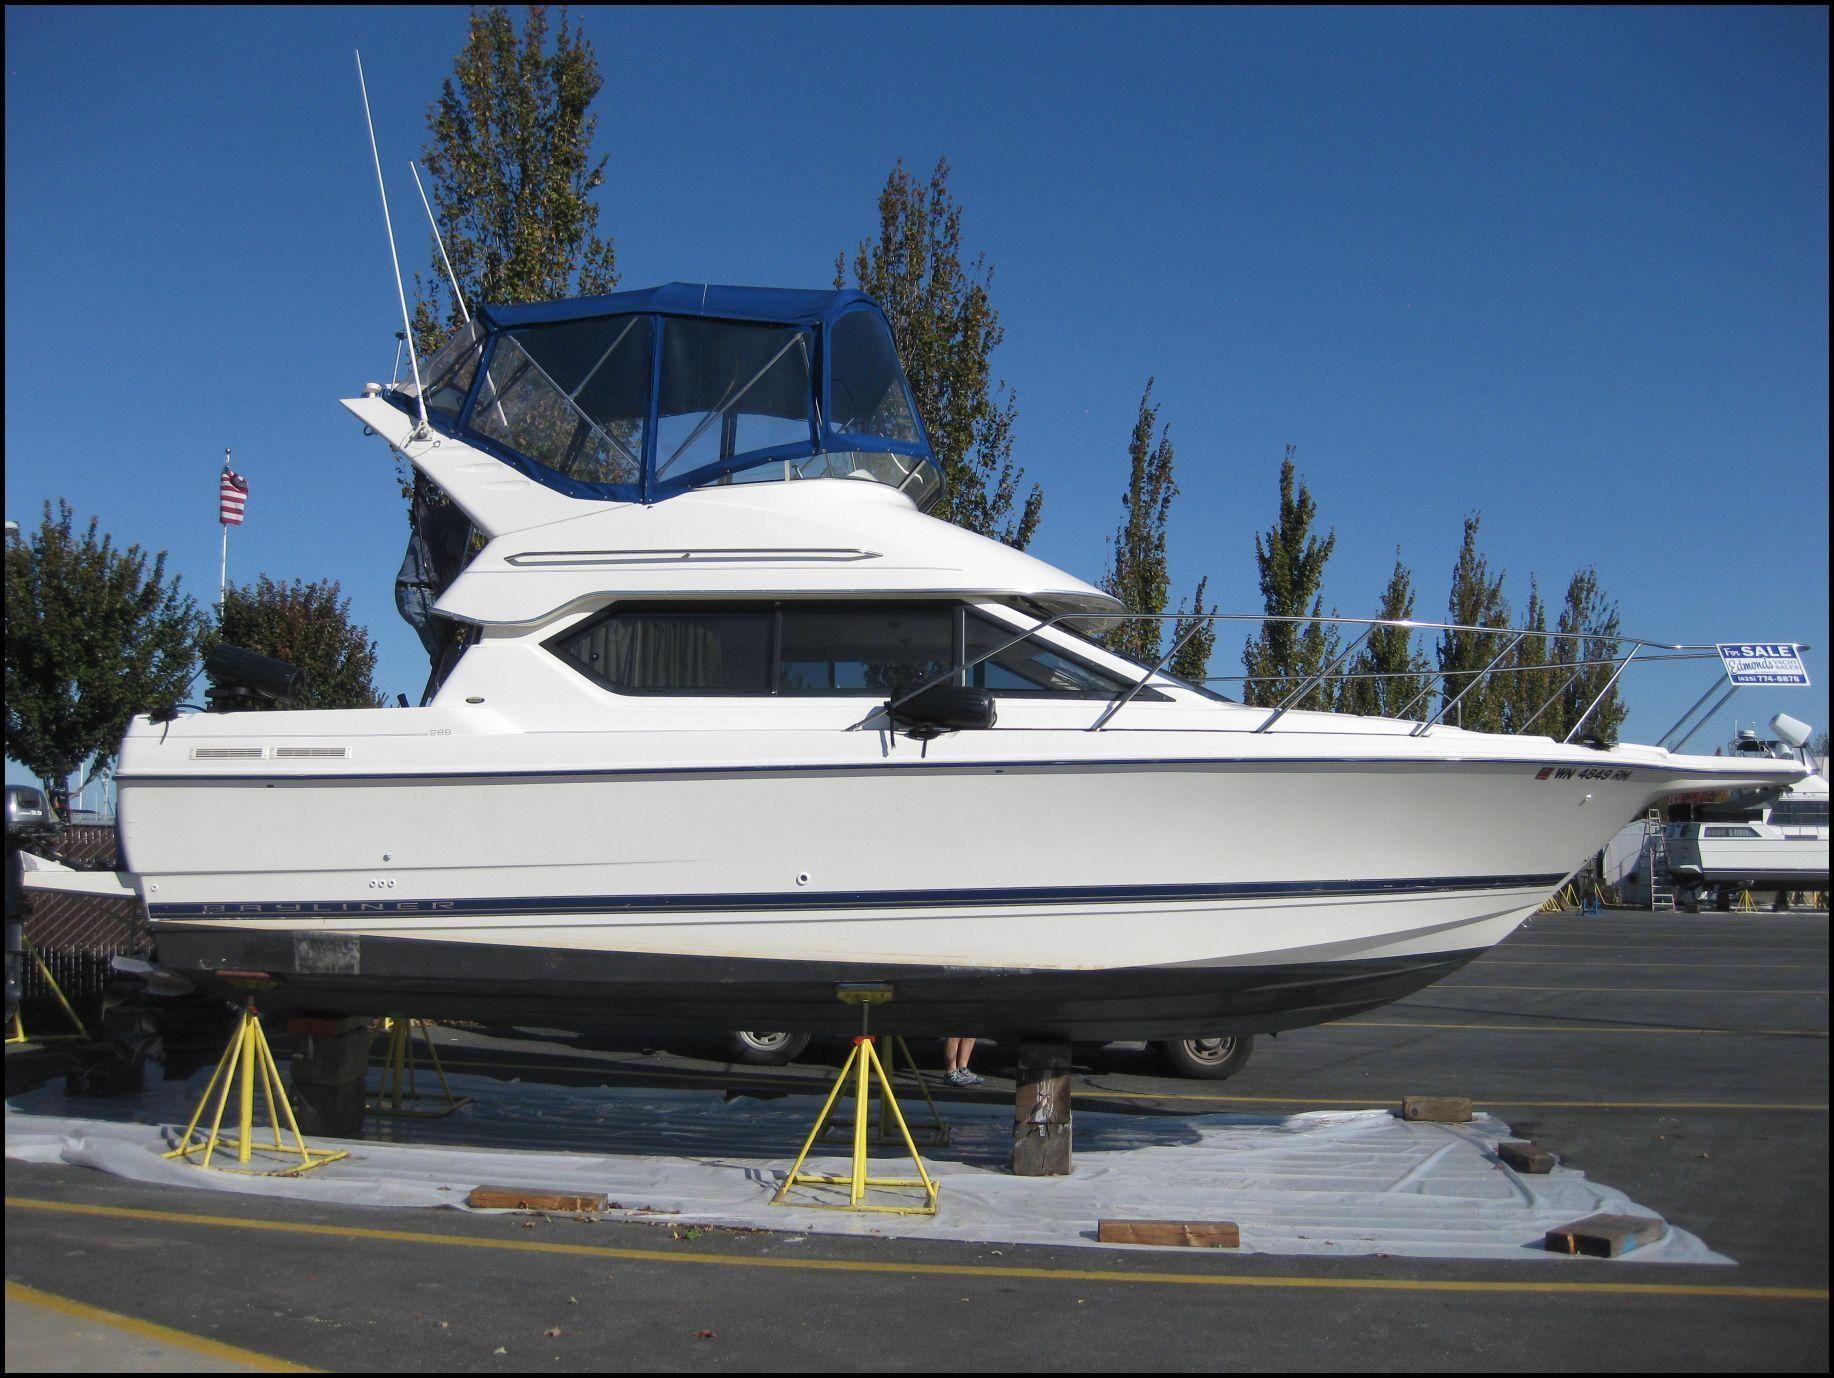 Edmonds (WA) United States  city images : 2003 Bayliner 2858 Ciera Power Boat For Sale www.yachtworld.com